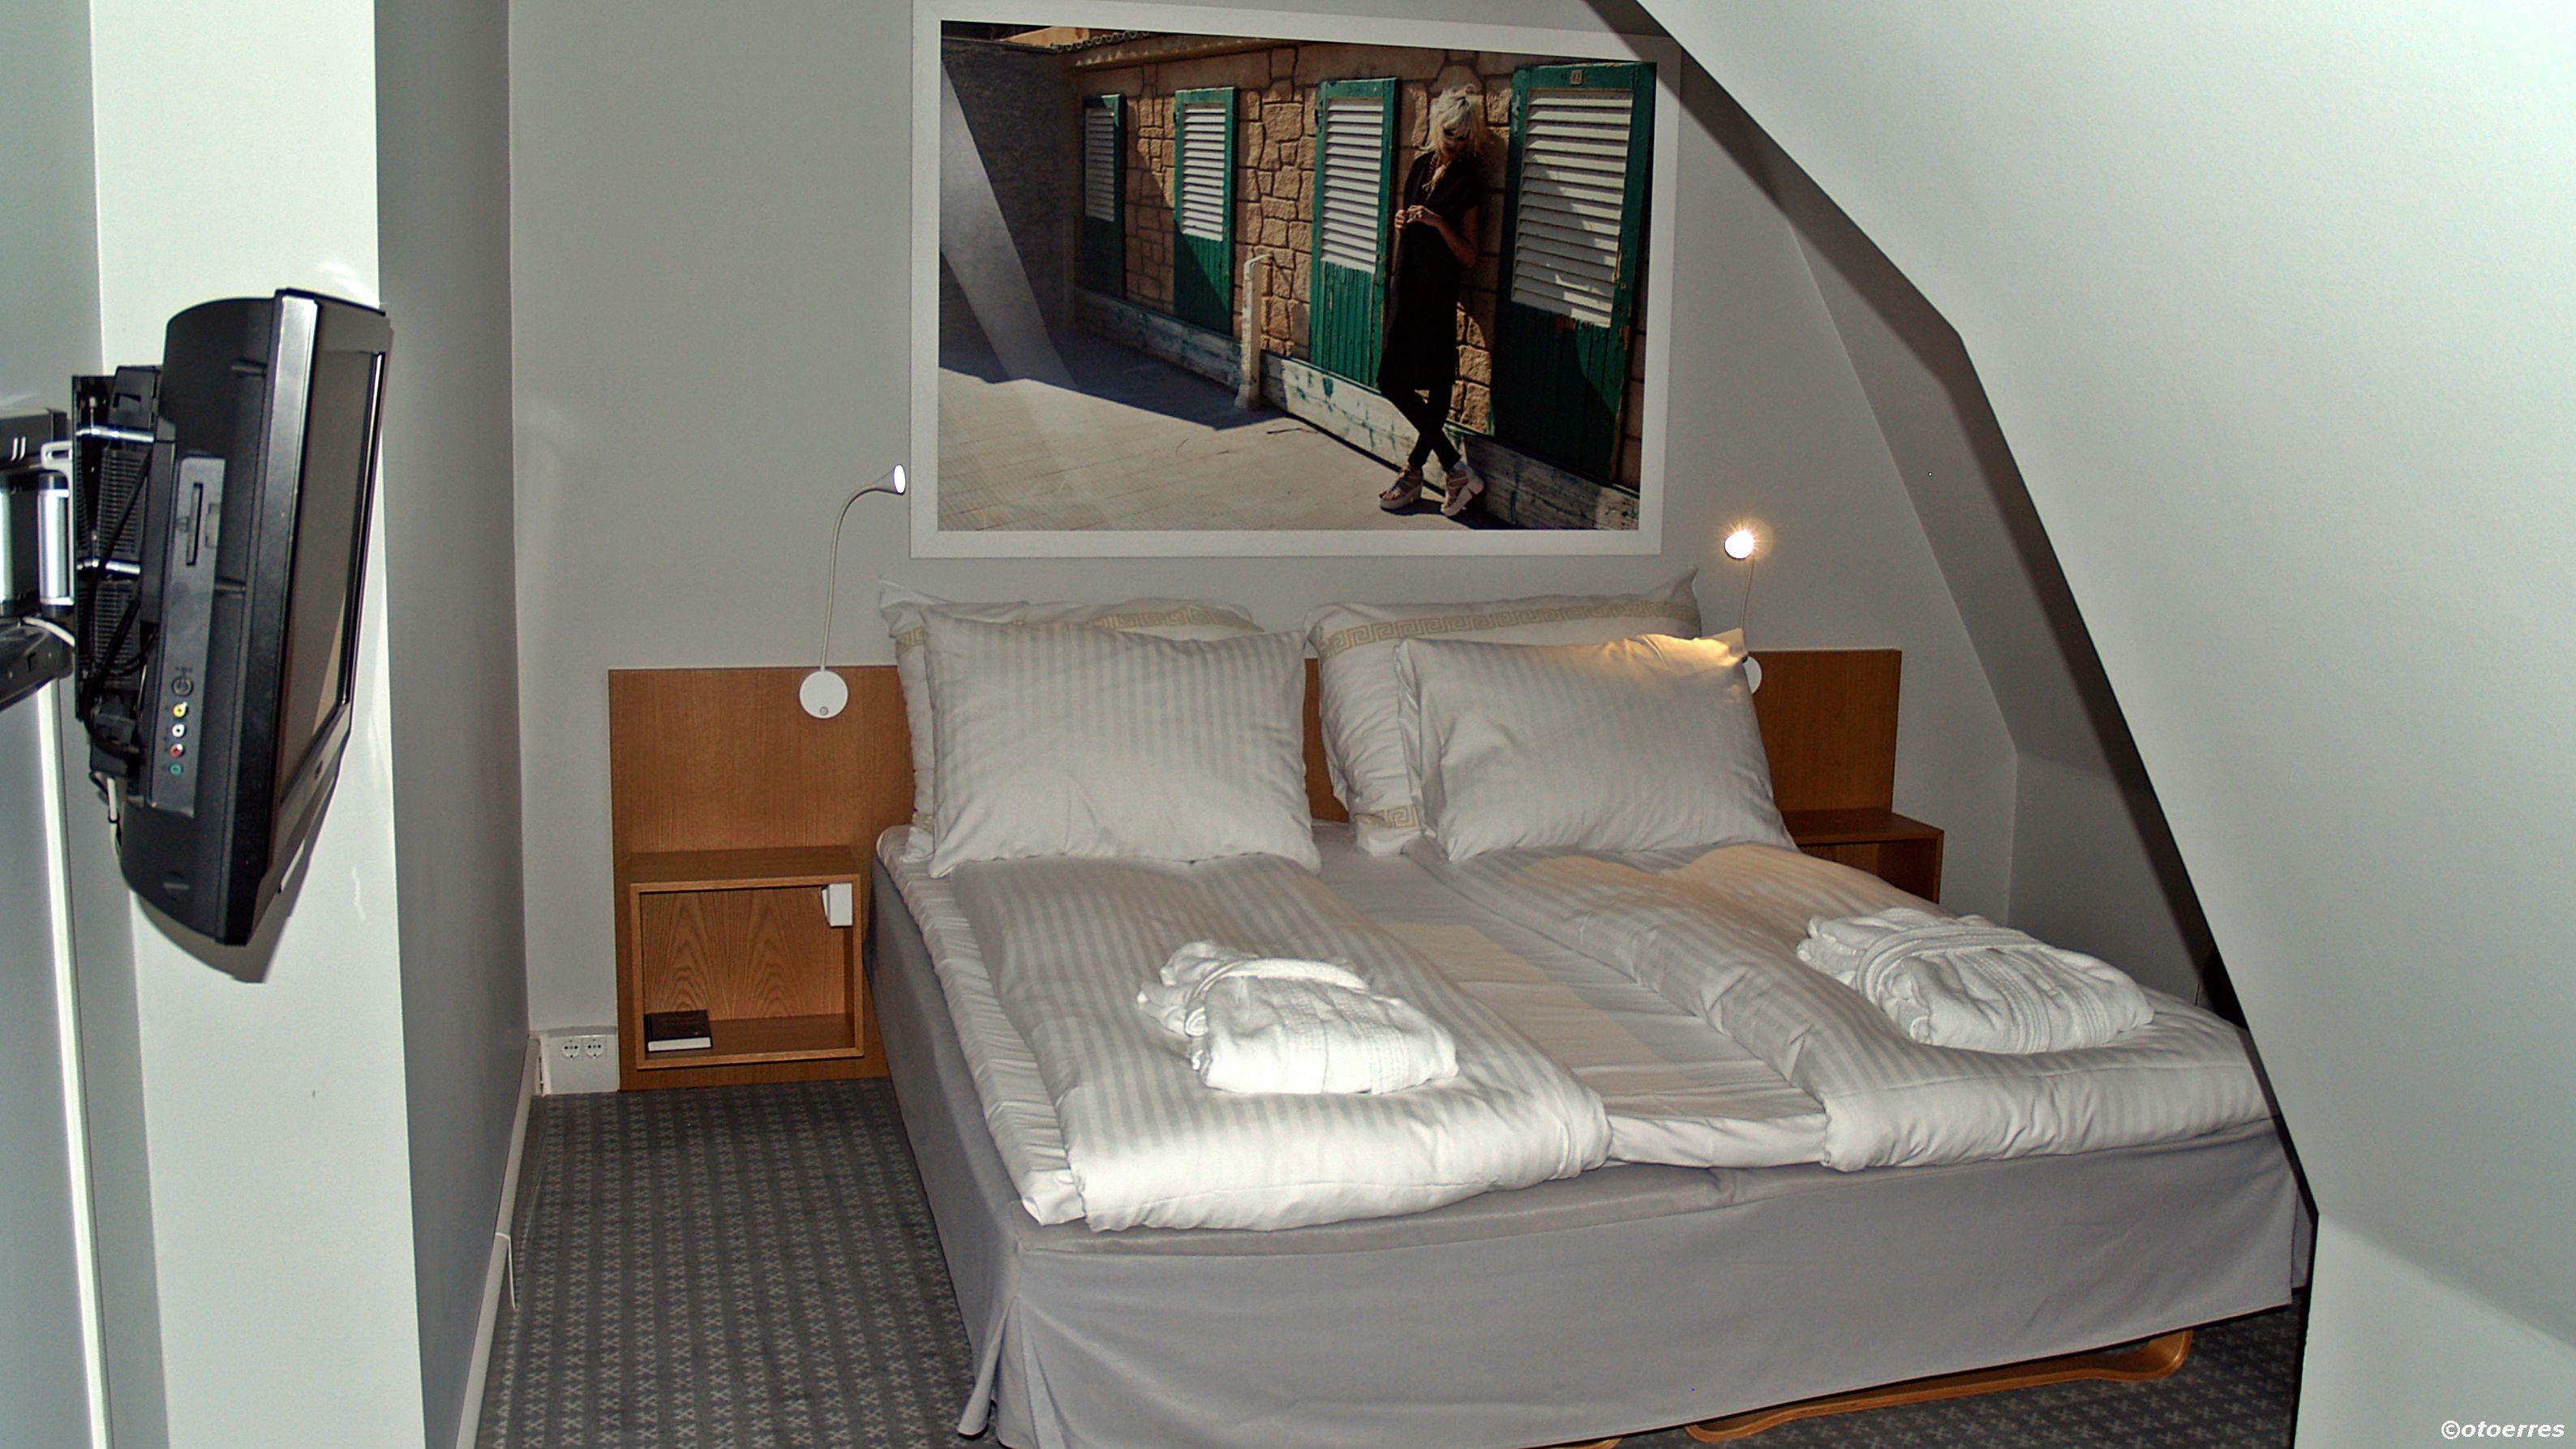 Radisson Blu Royal Hotel Stavanger